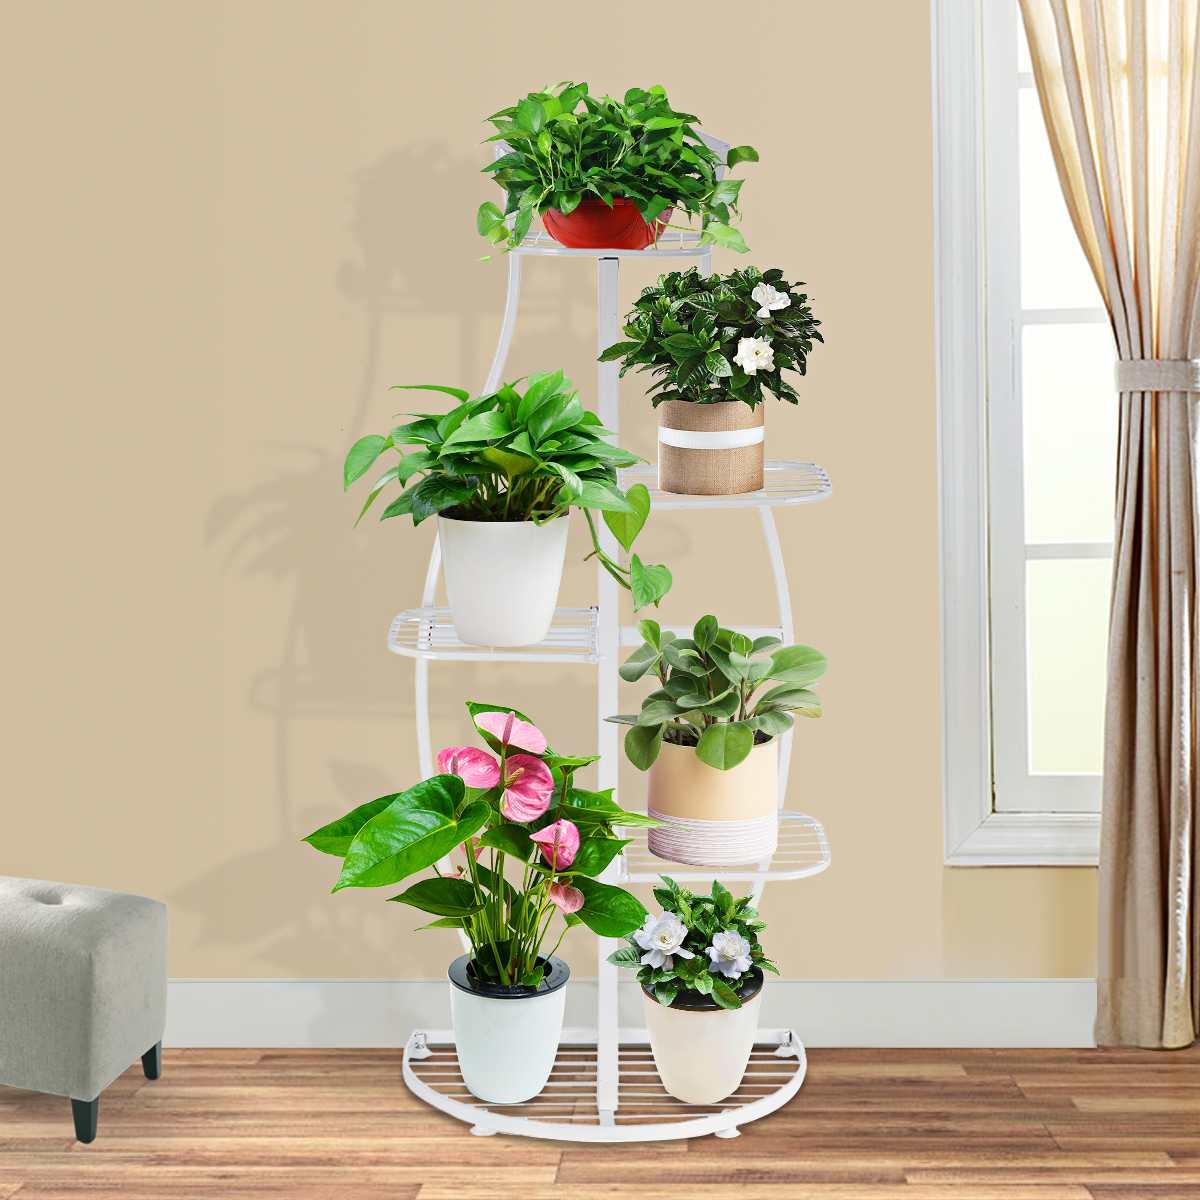 5 Tiers Multifunction Storage Shelf Iron Art Plant Holder Home Garden flower pot Organizer Living room balcony Storage Rack